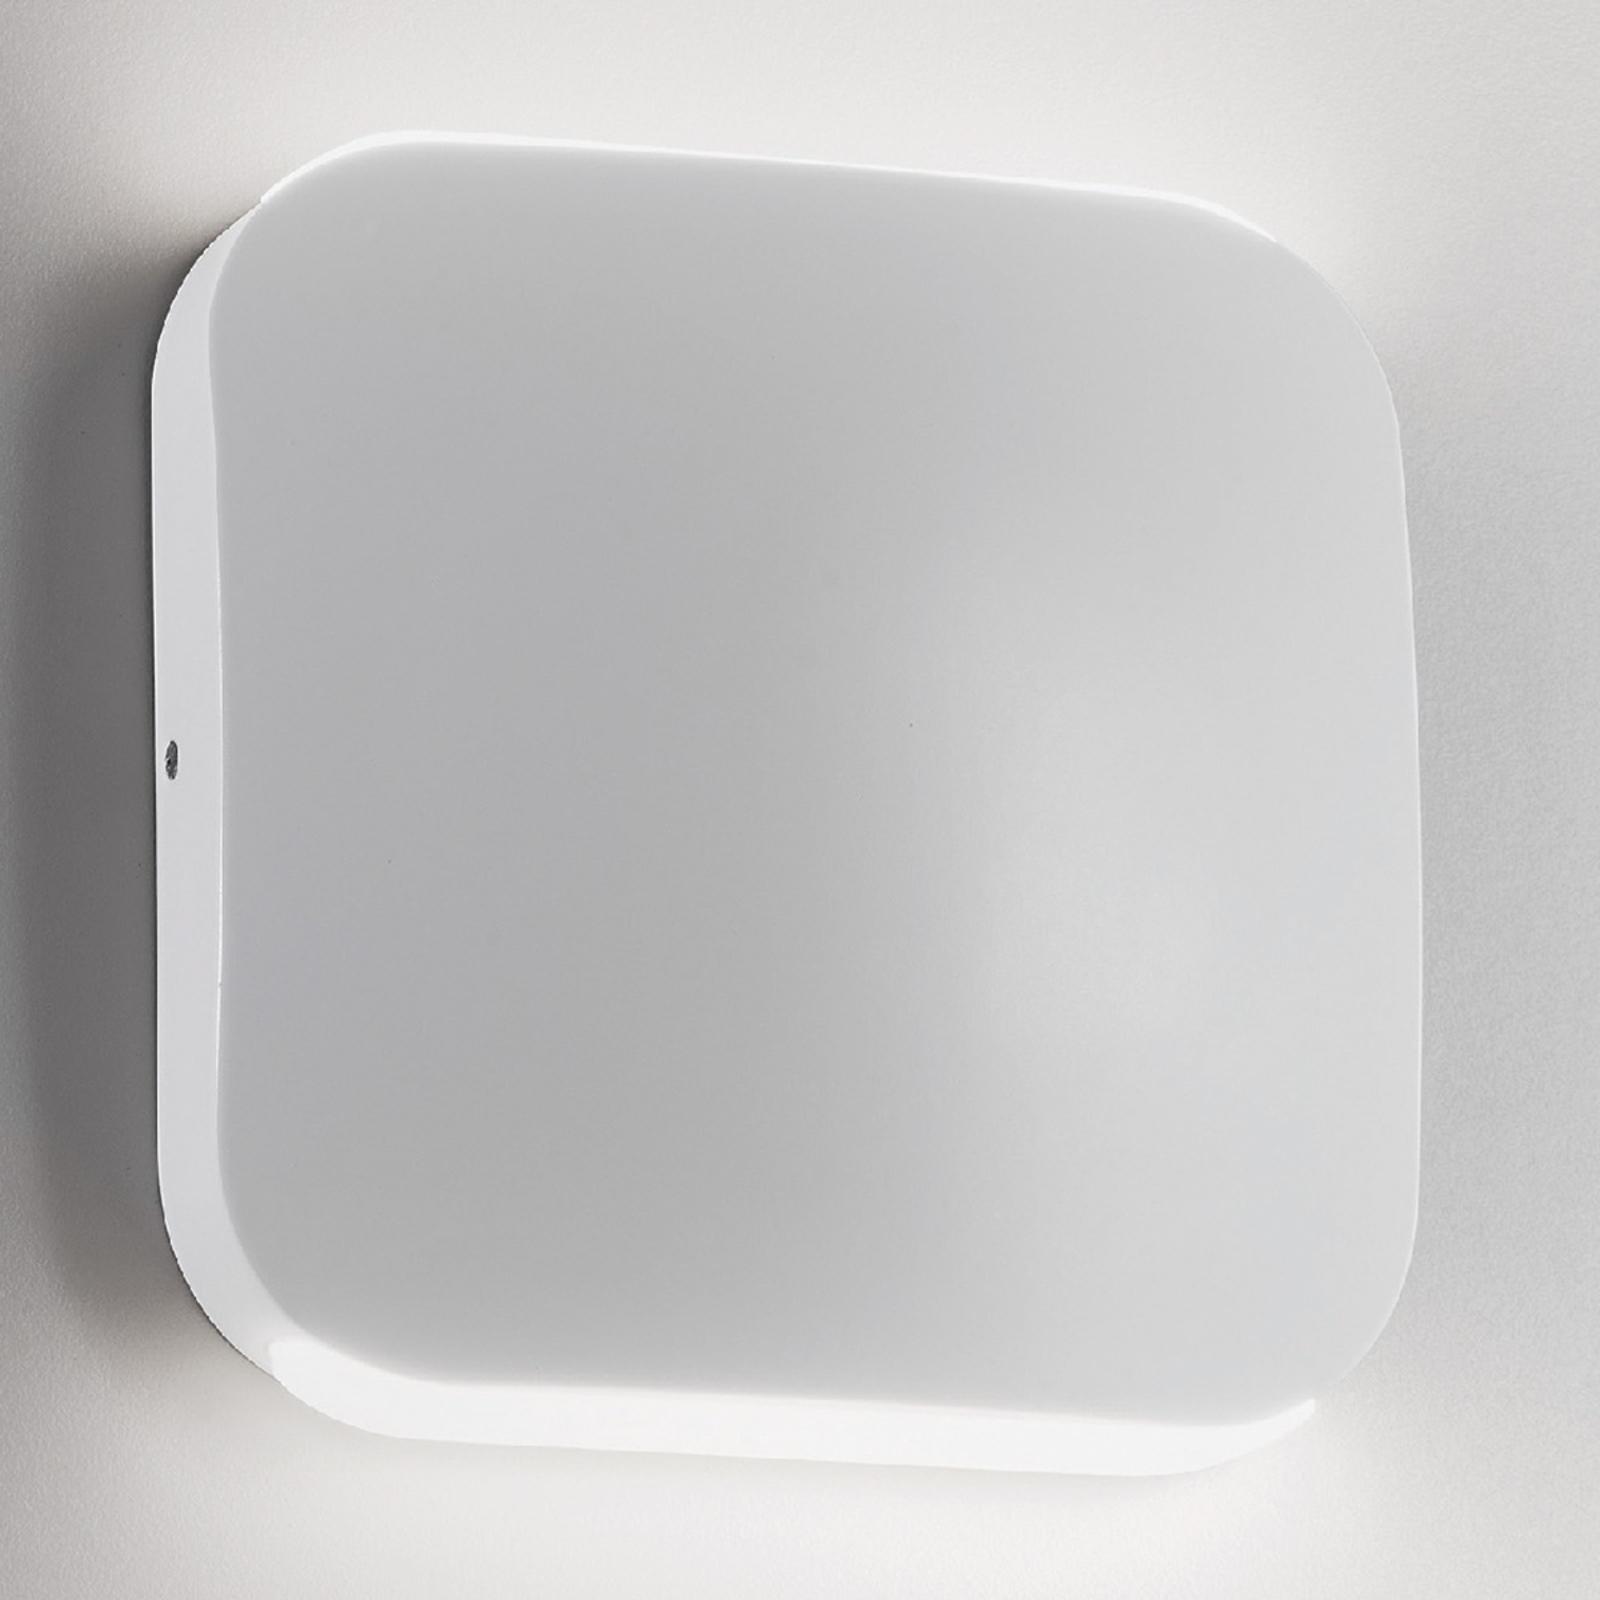 LED buitenwandlamp Astuccio wit